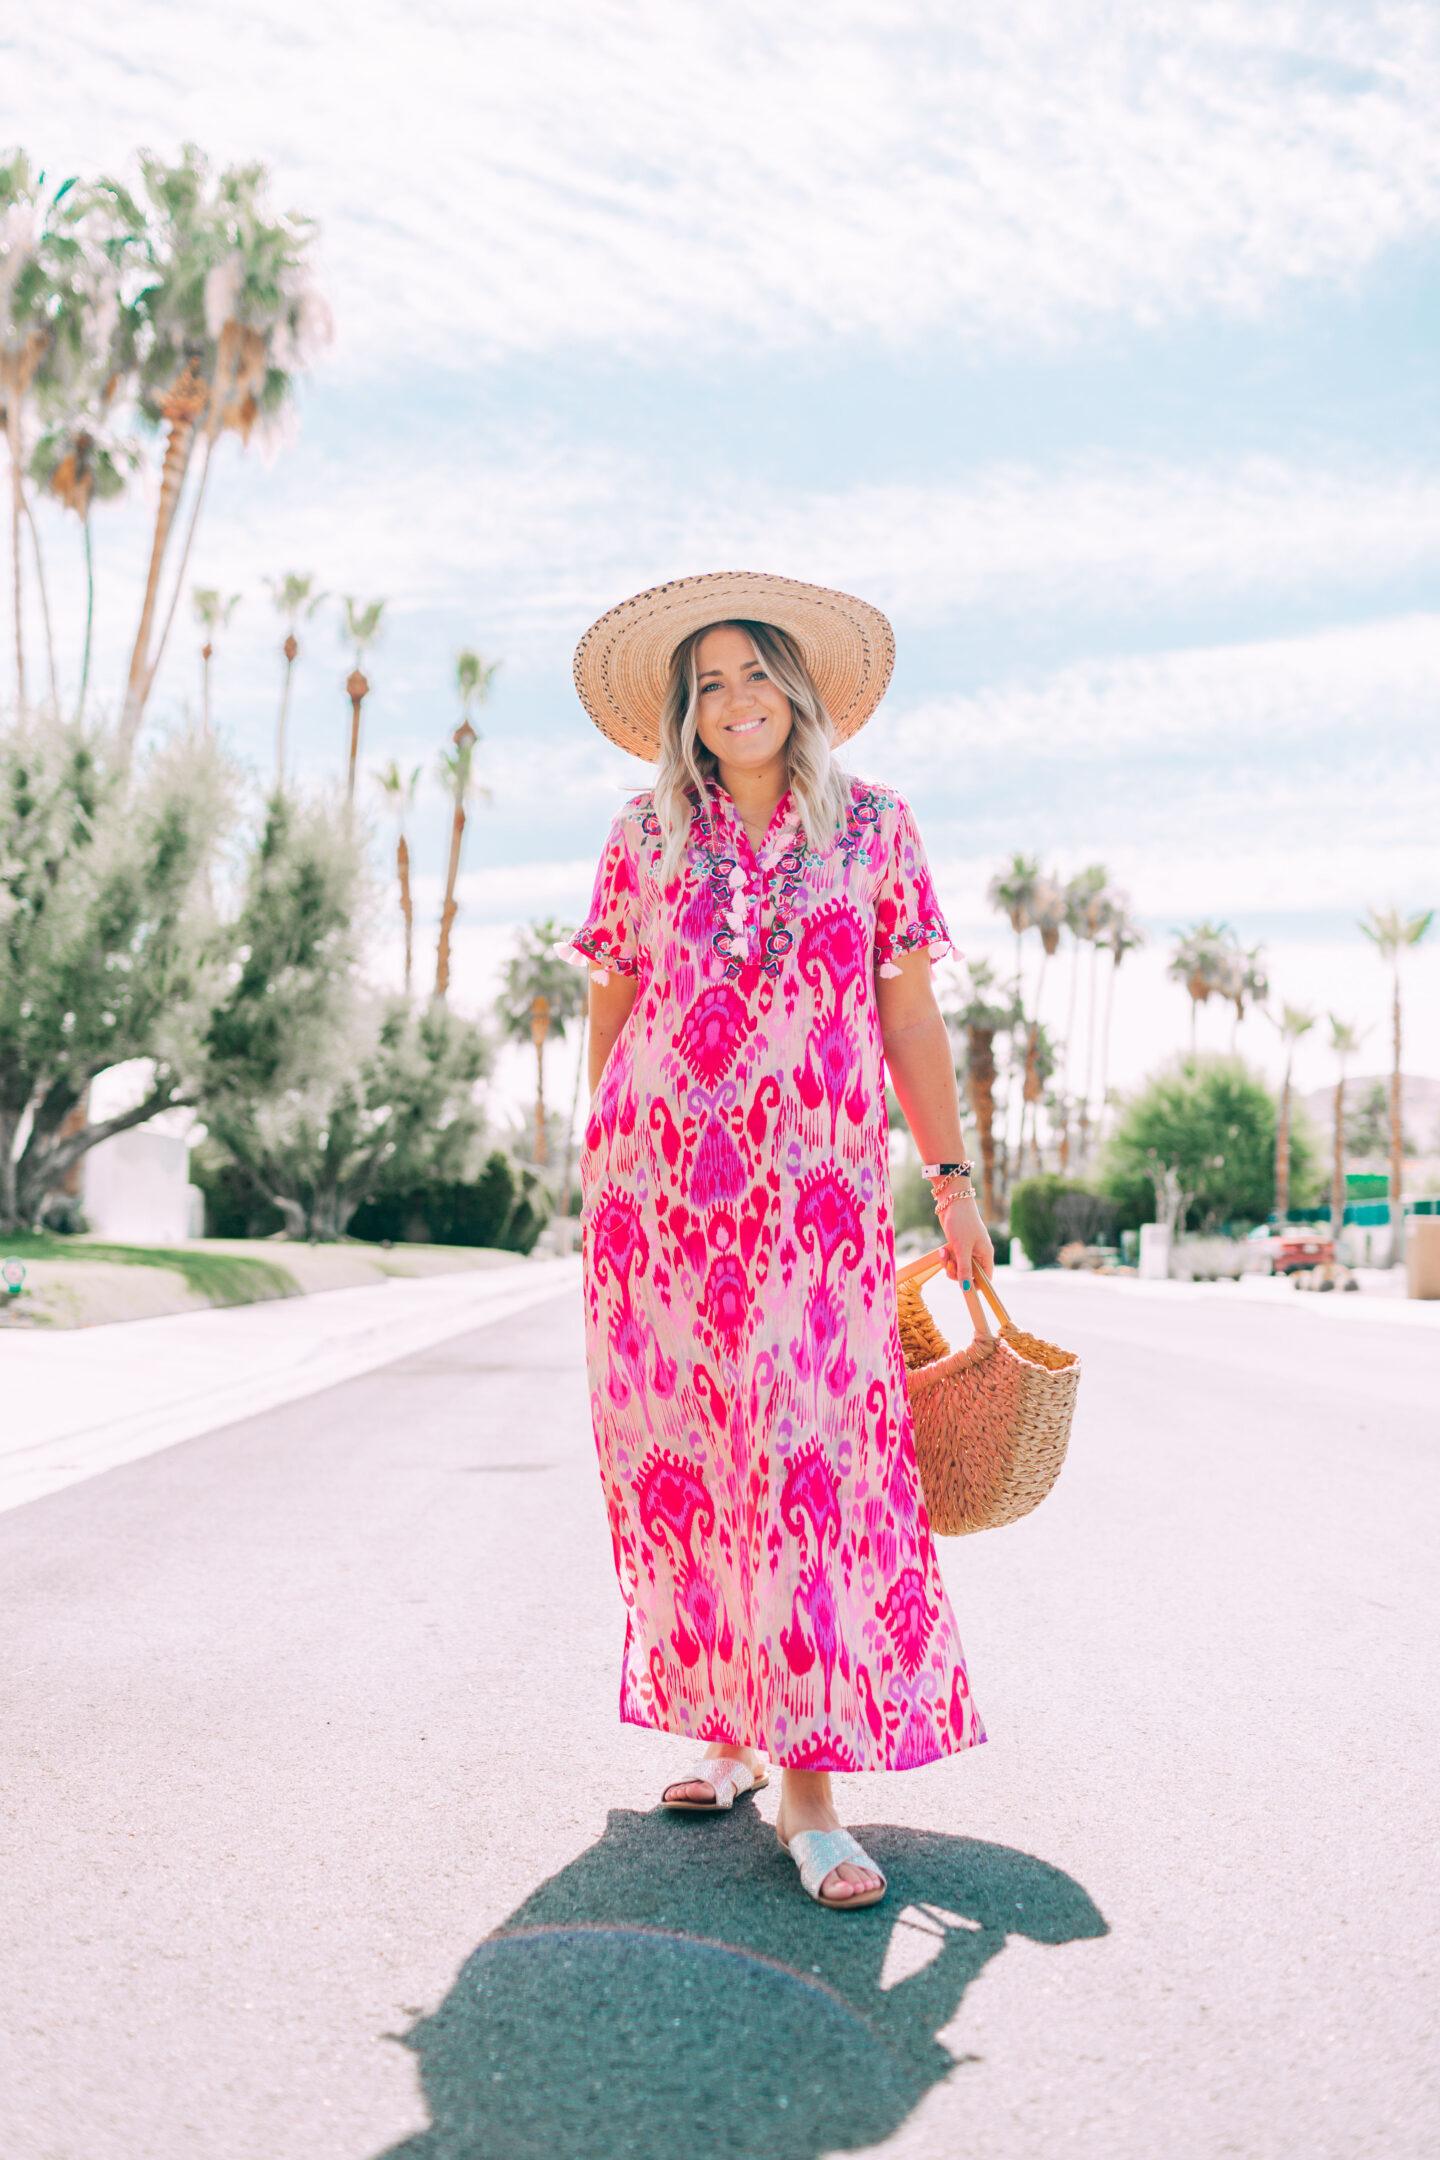 hot pink boho printed maxi dress in palm springs